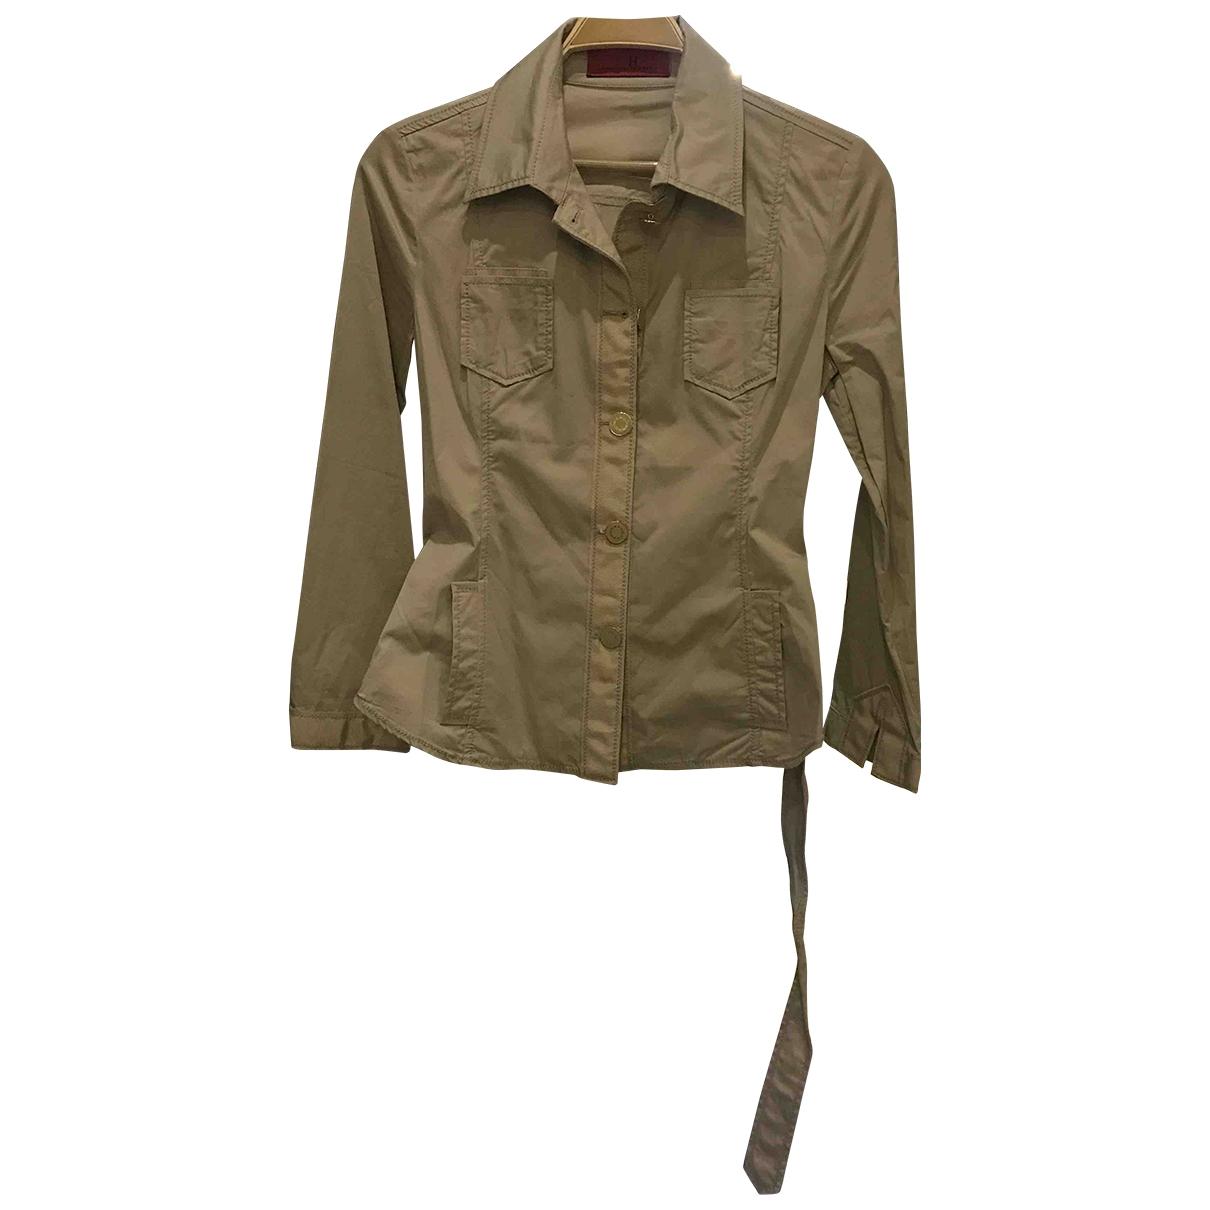 Carolina Herrera \N Beige Cotton jacket for Women 6 US